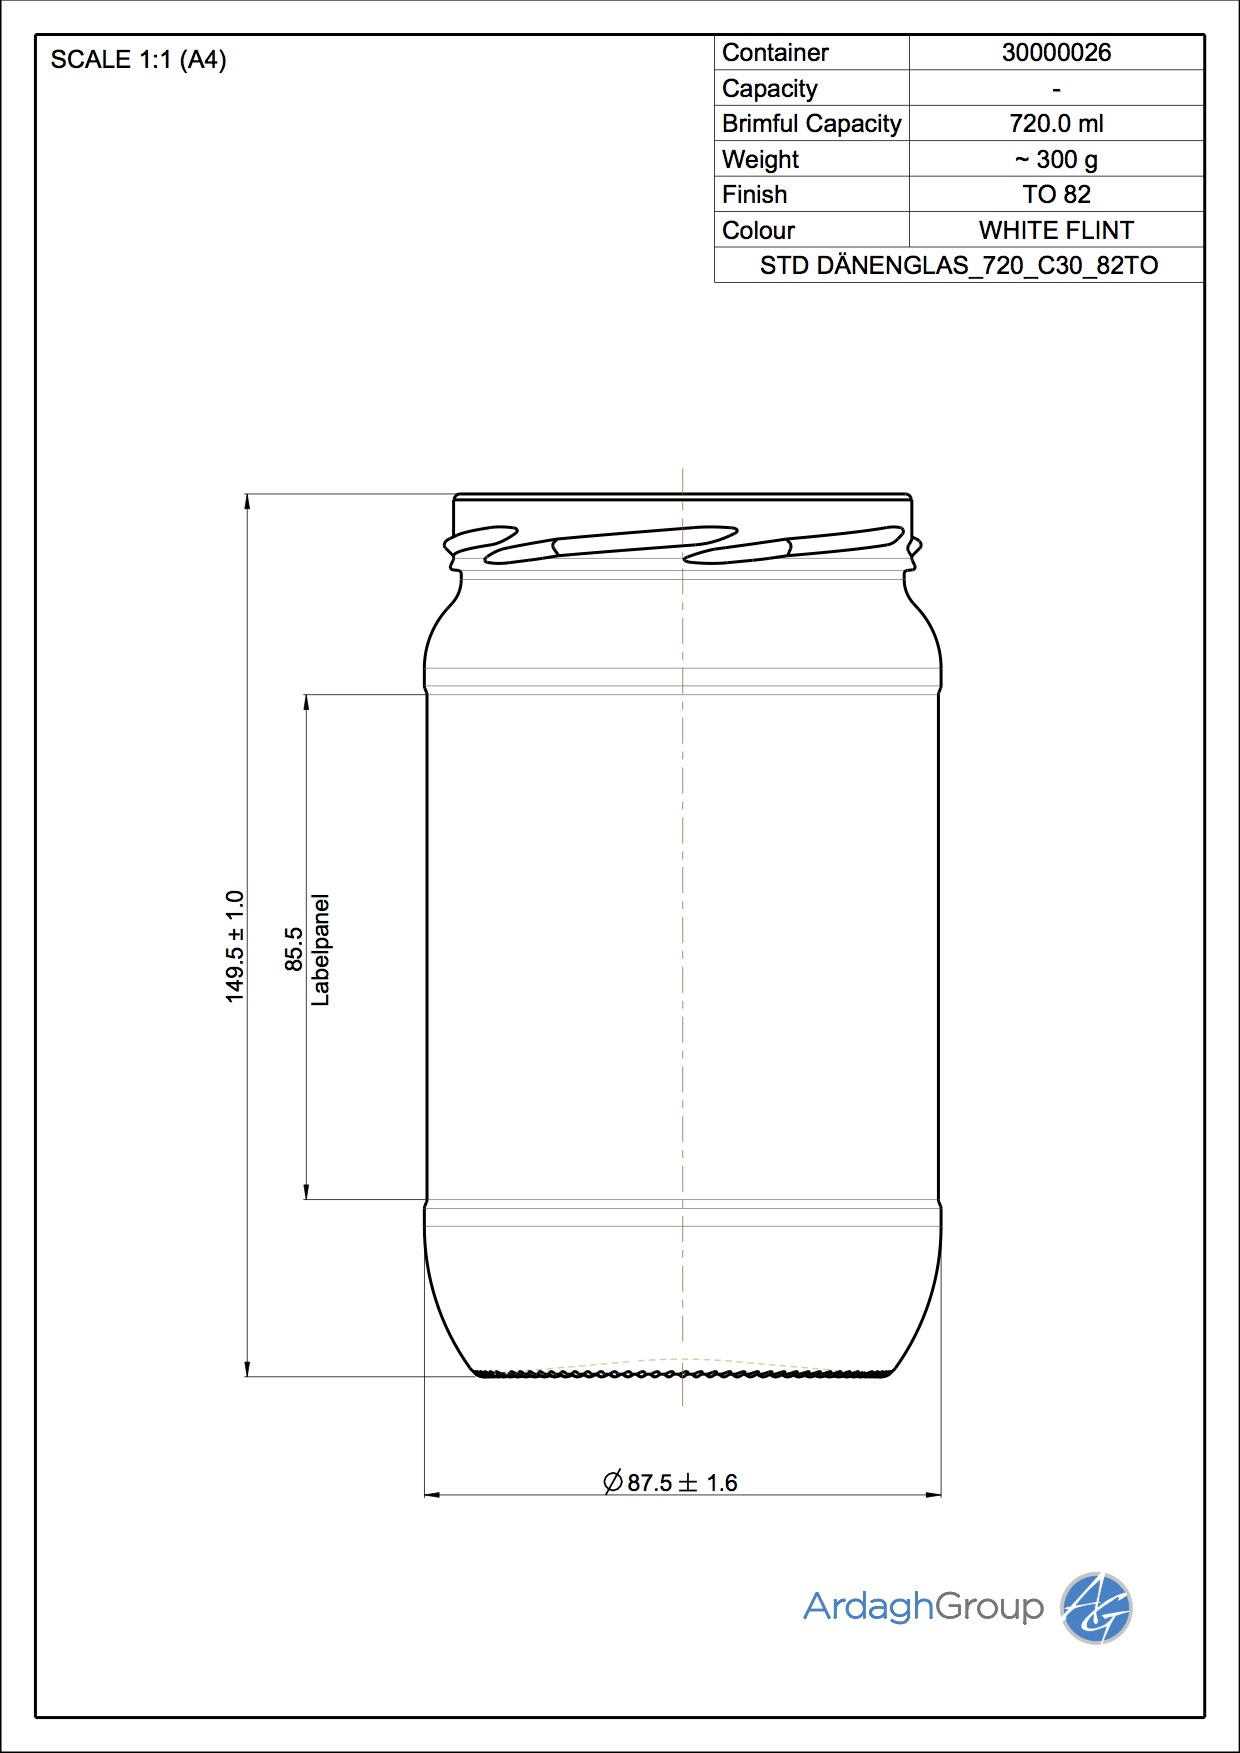 Daenenglas 720 C30 82TO